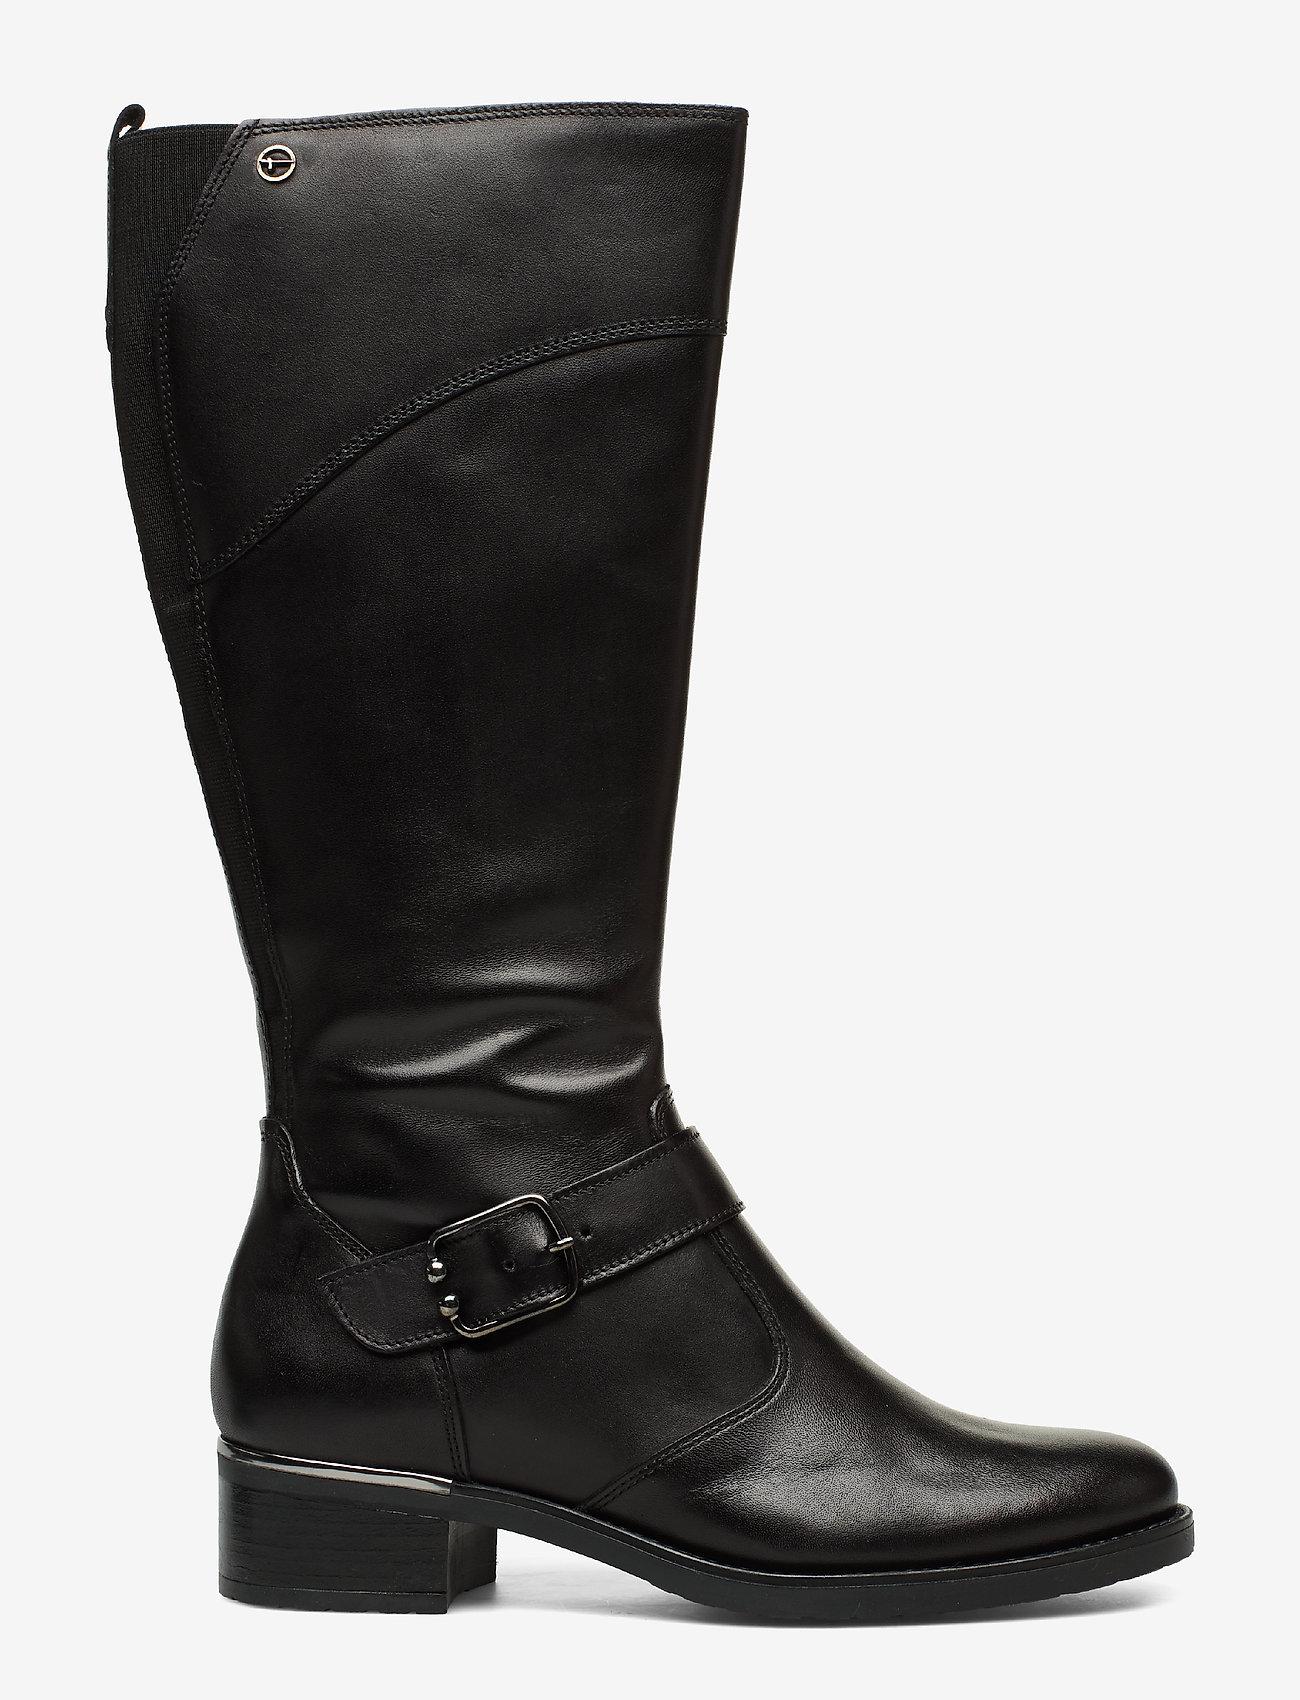 Tamaris - Boots - long boots - black - 1